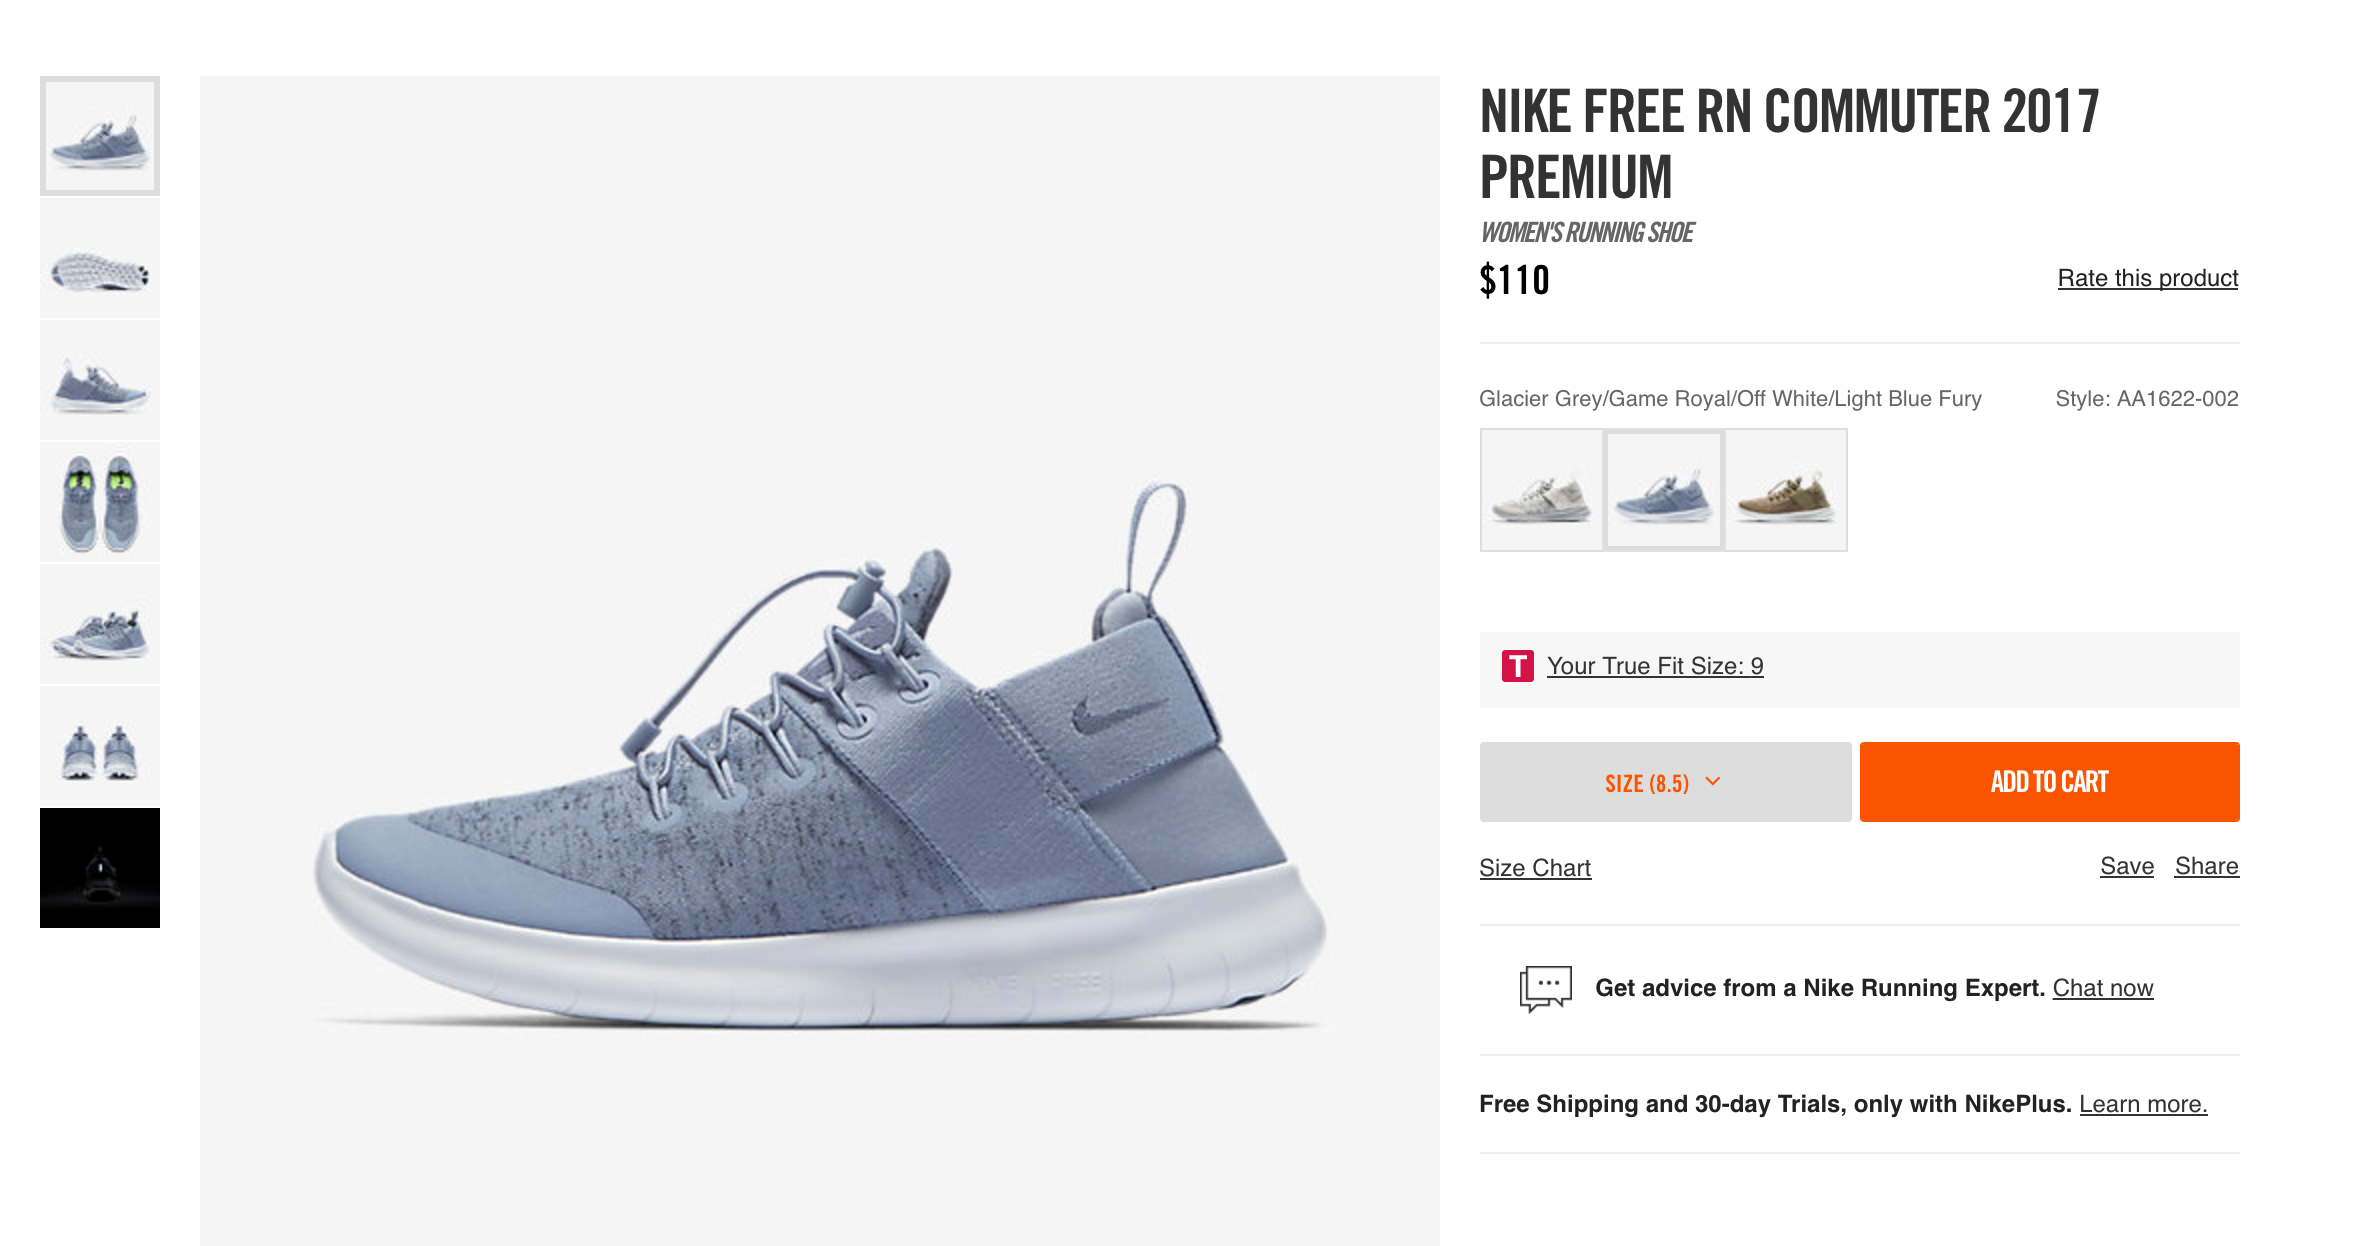 4ce109b8eb89d Size 8.5 Nike Free RN Commuter 2017 Premium in Glacier Gray https   store